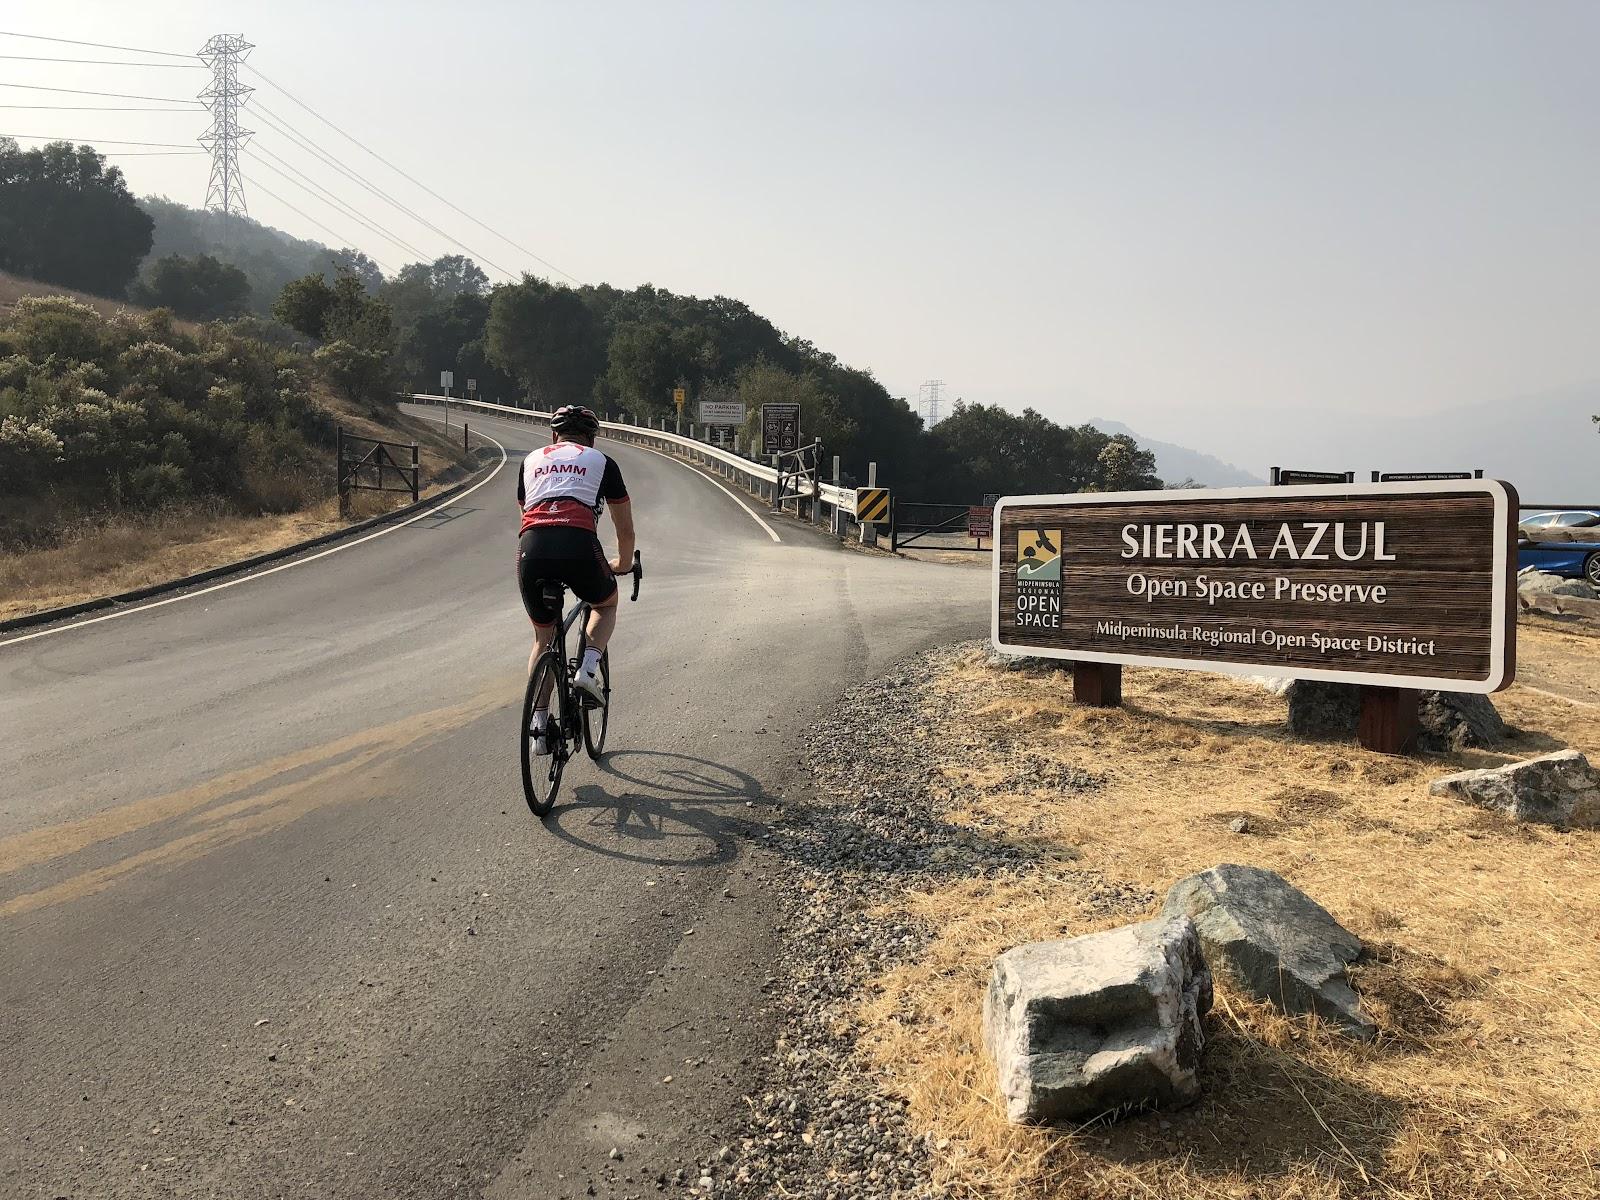 Cycling Mt. Umunhum - PJAMM cyclist on bike entering Sierra Azul Open Space Preserve on Mt. Umunhum Road